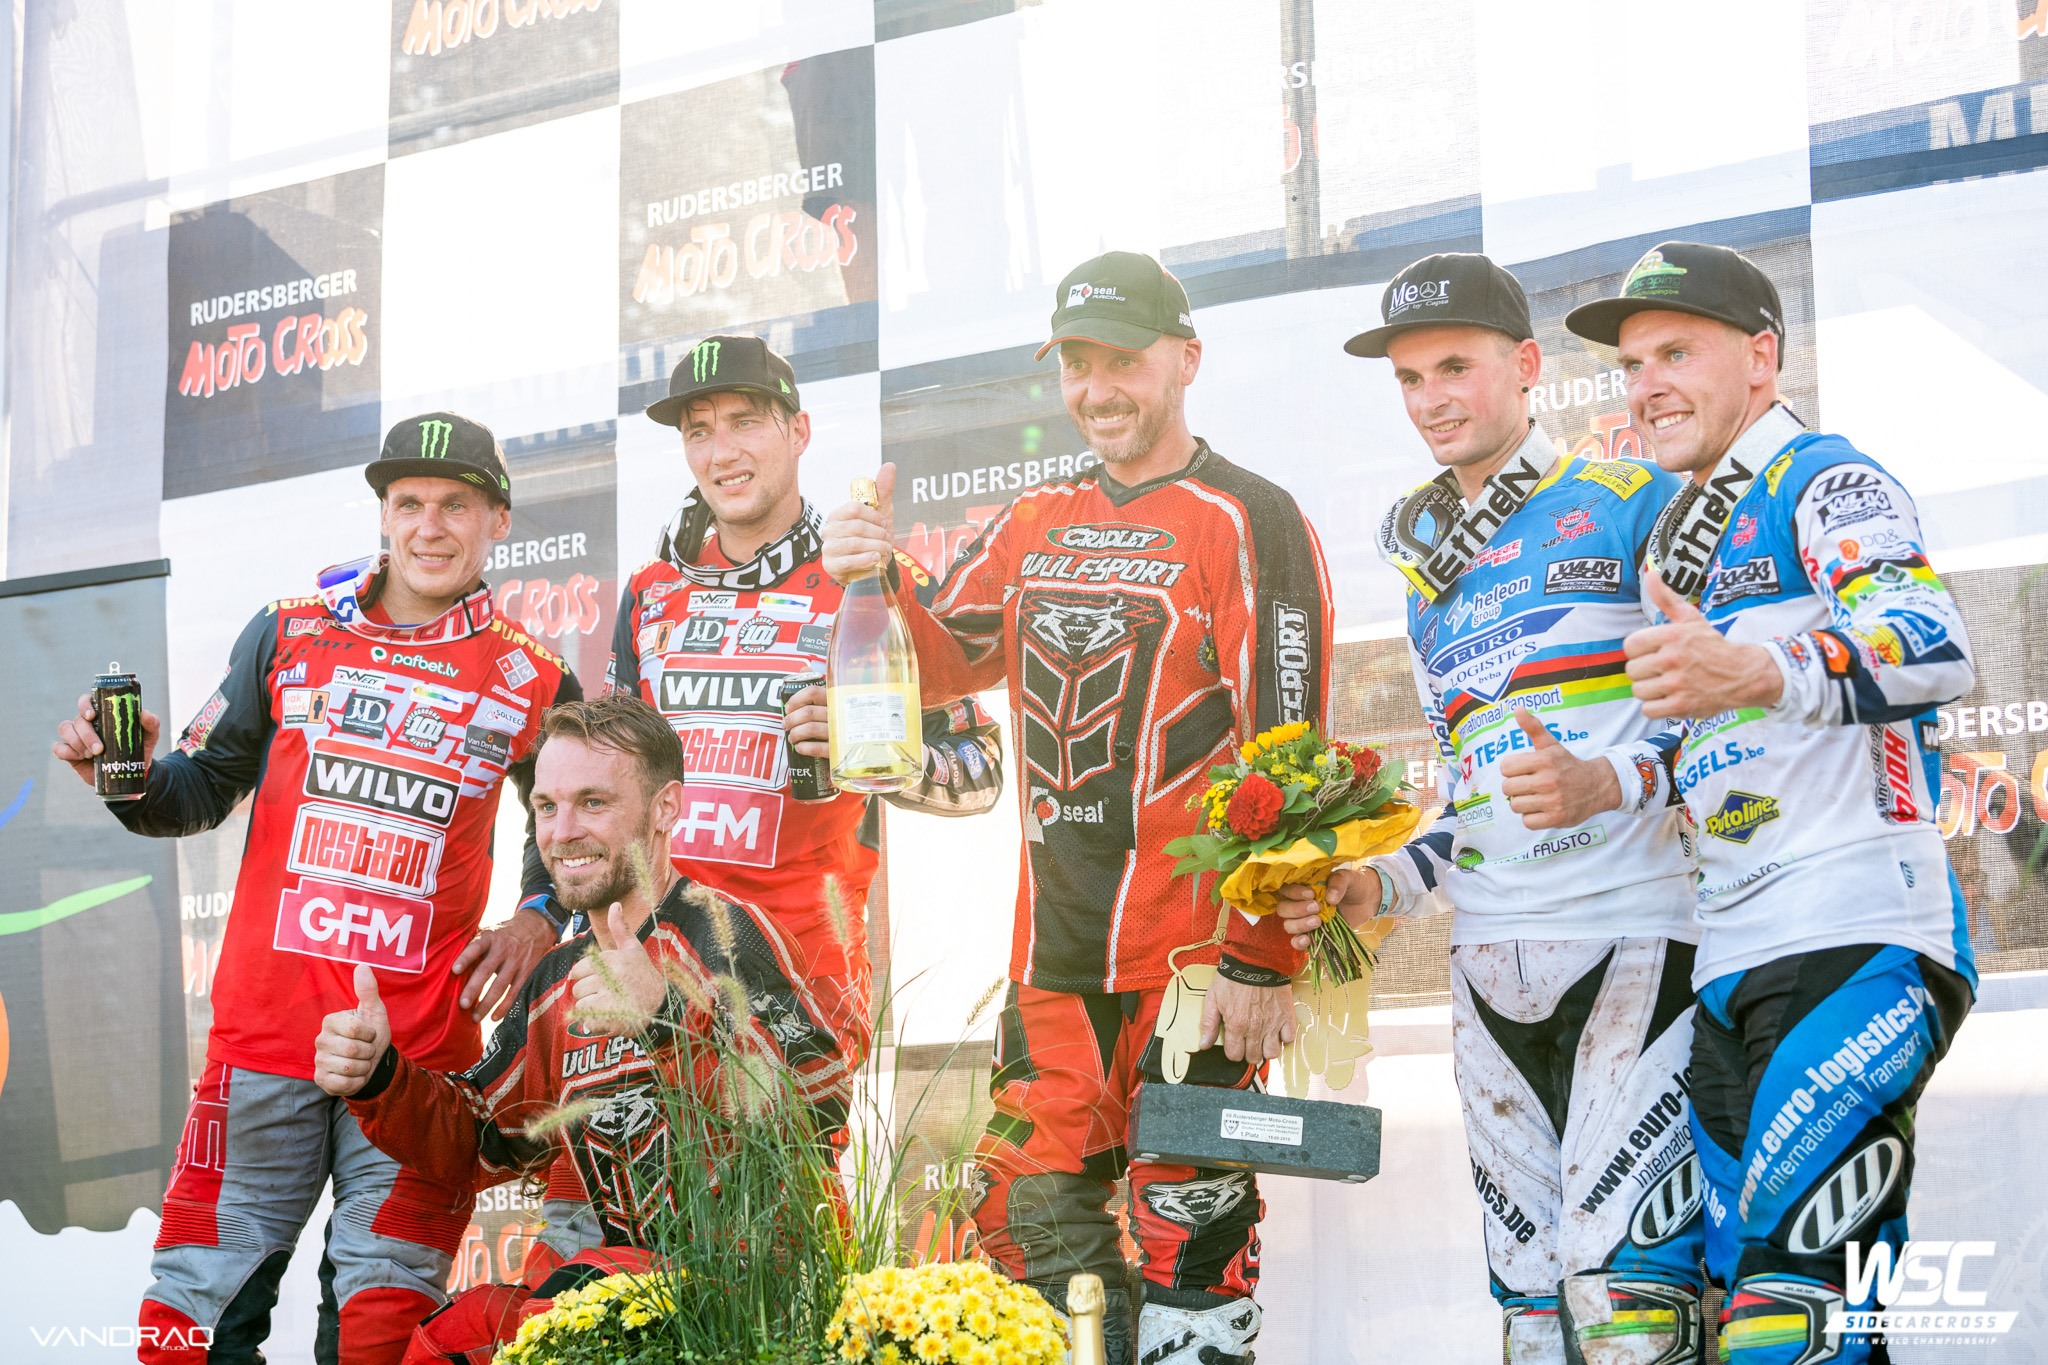 Sidecar Motocross Racing